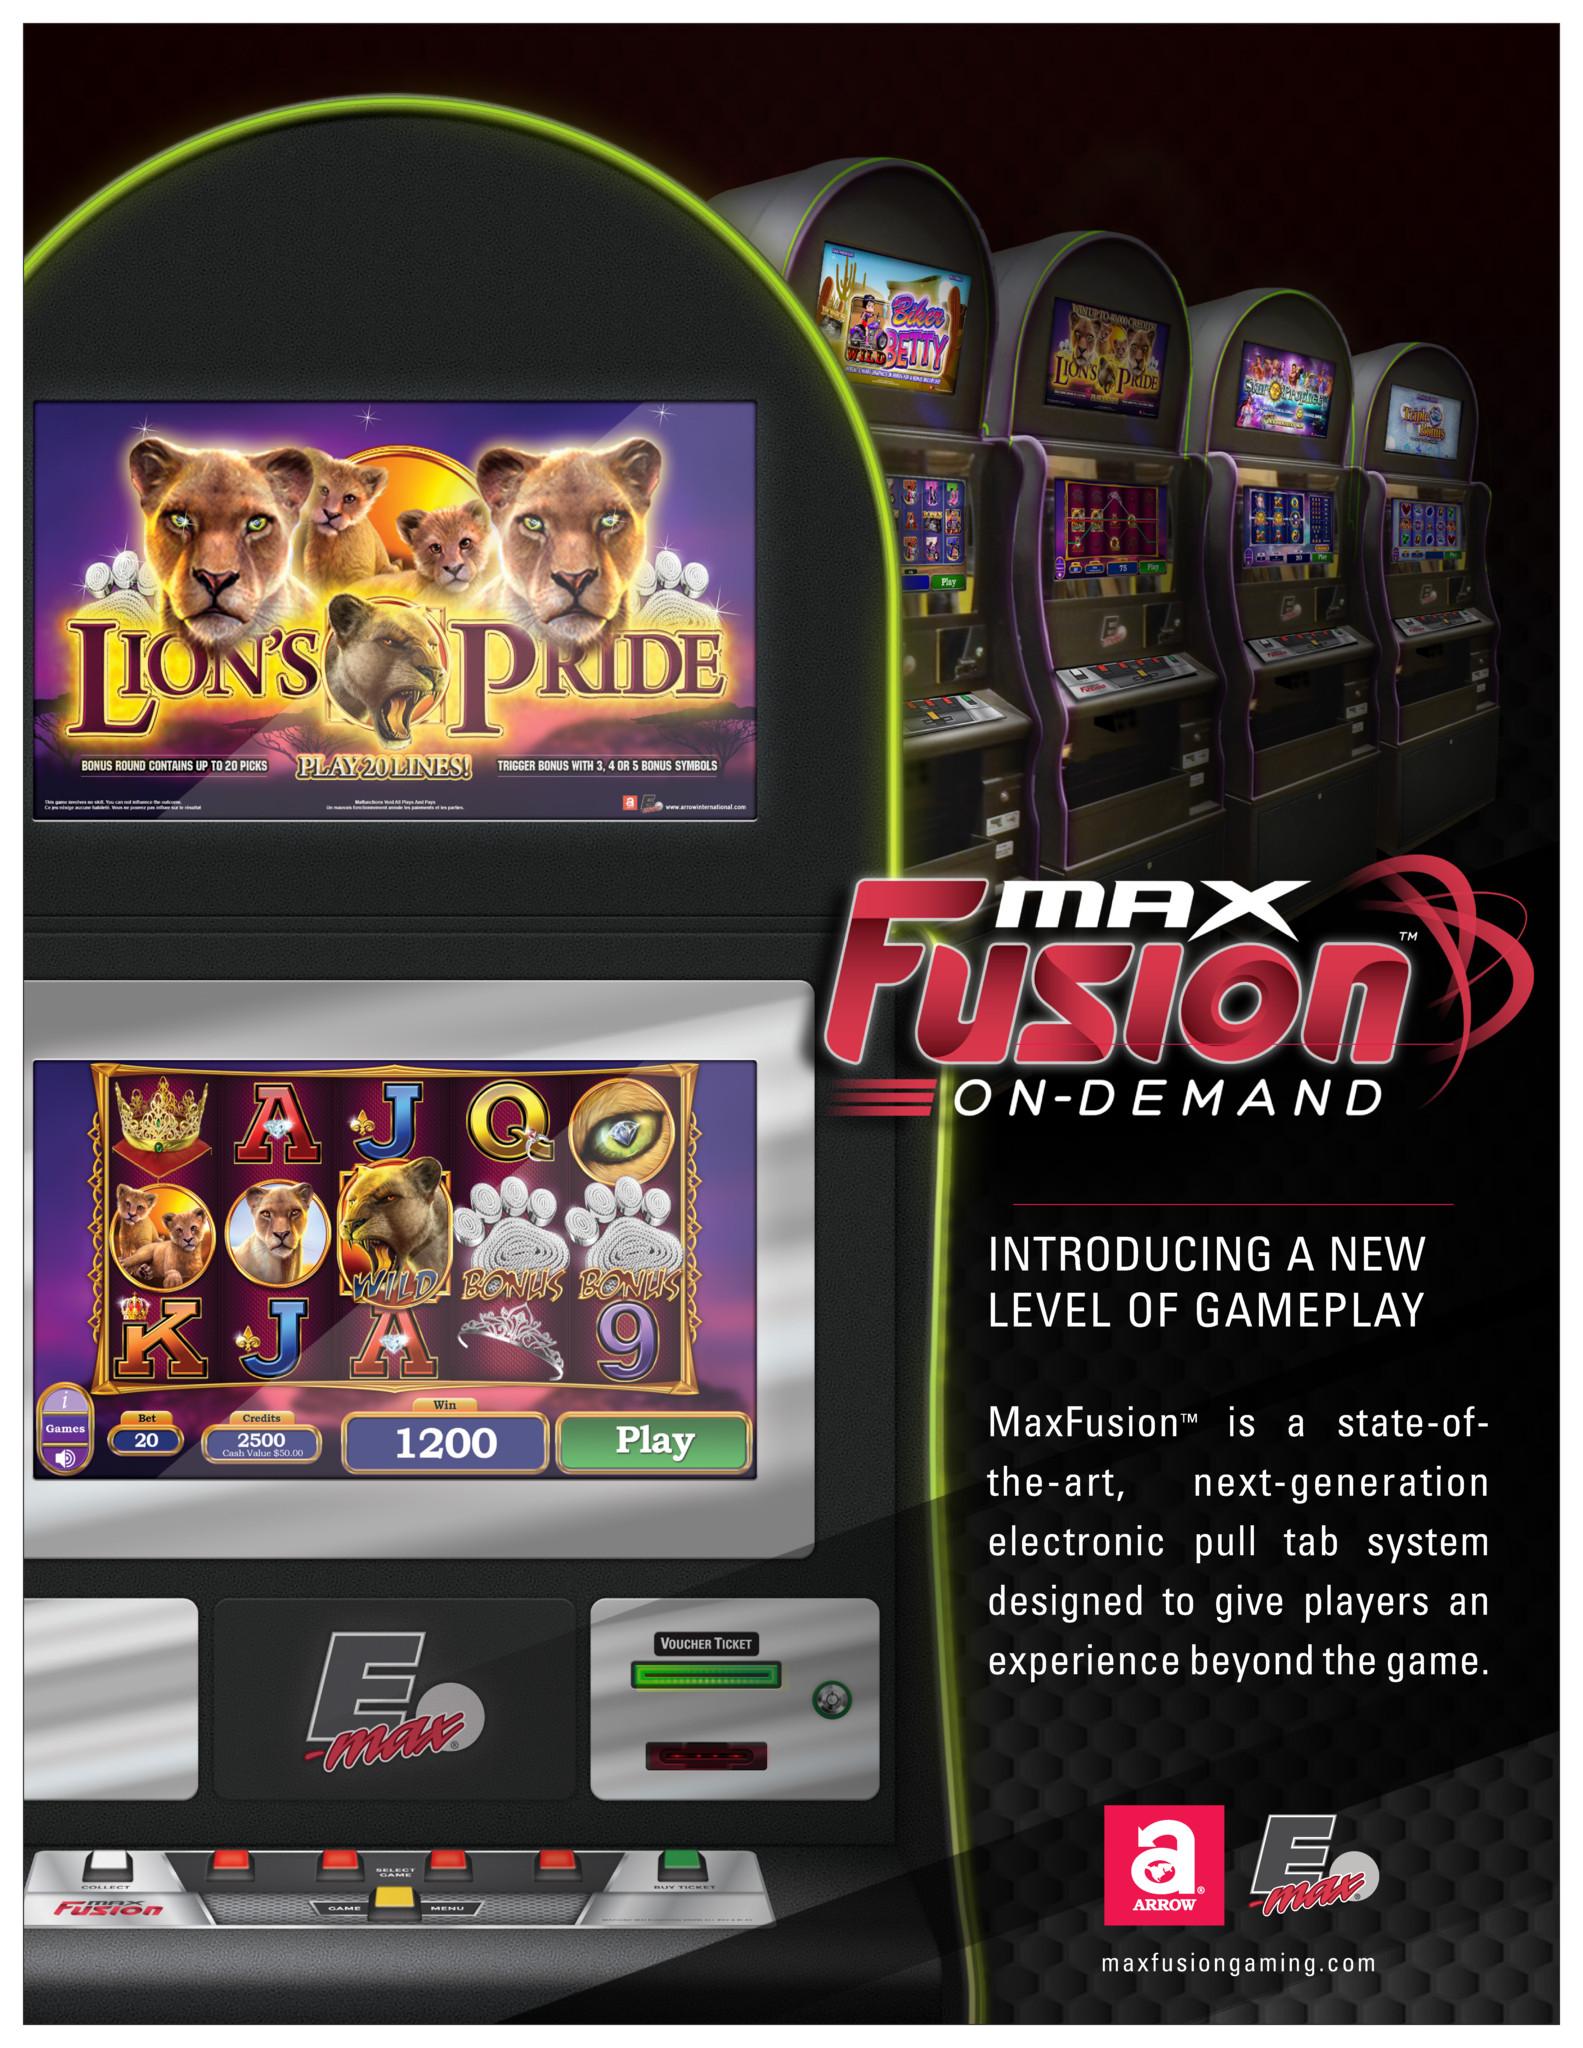 MaxFusion OnDemand Flyer Promotional Materials/Equipment Flyers & Brochures